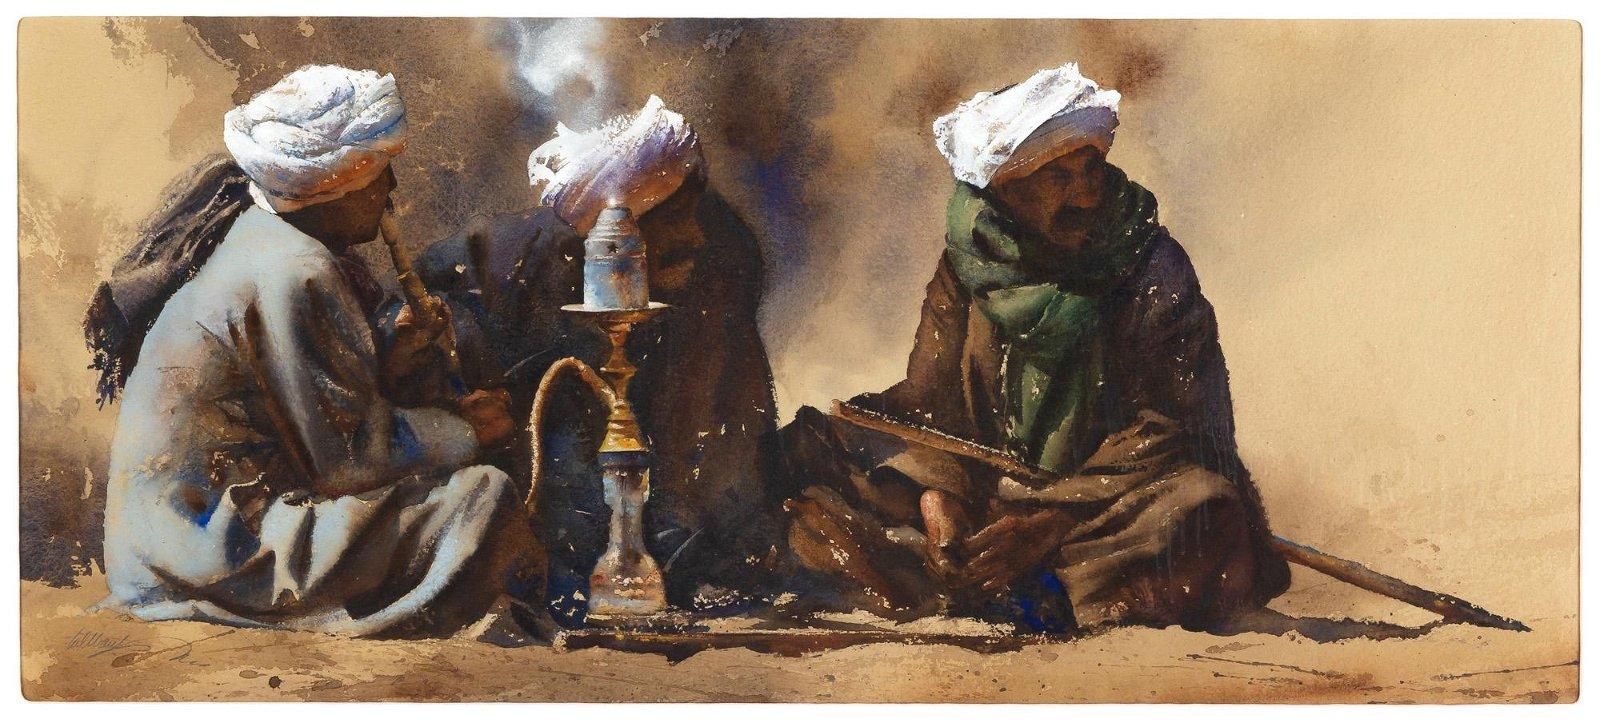 William Matthews (American, b. 1949) Middle Eastern